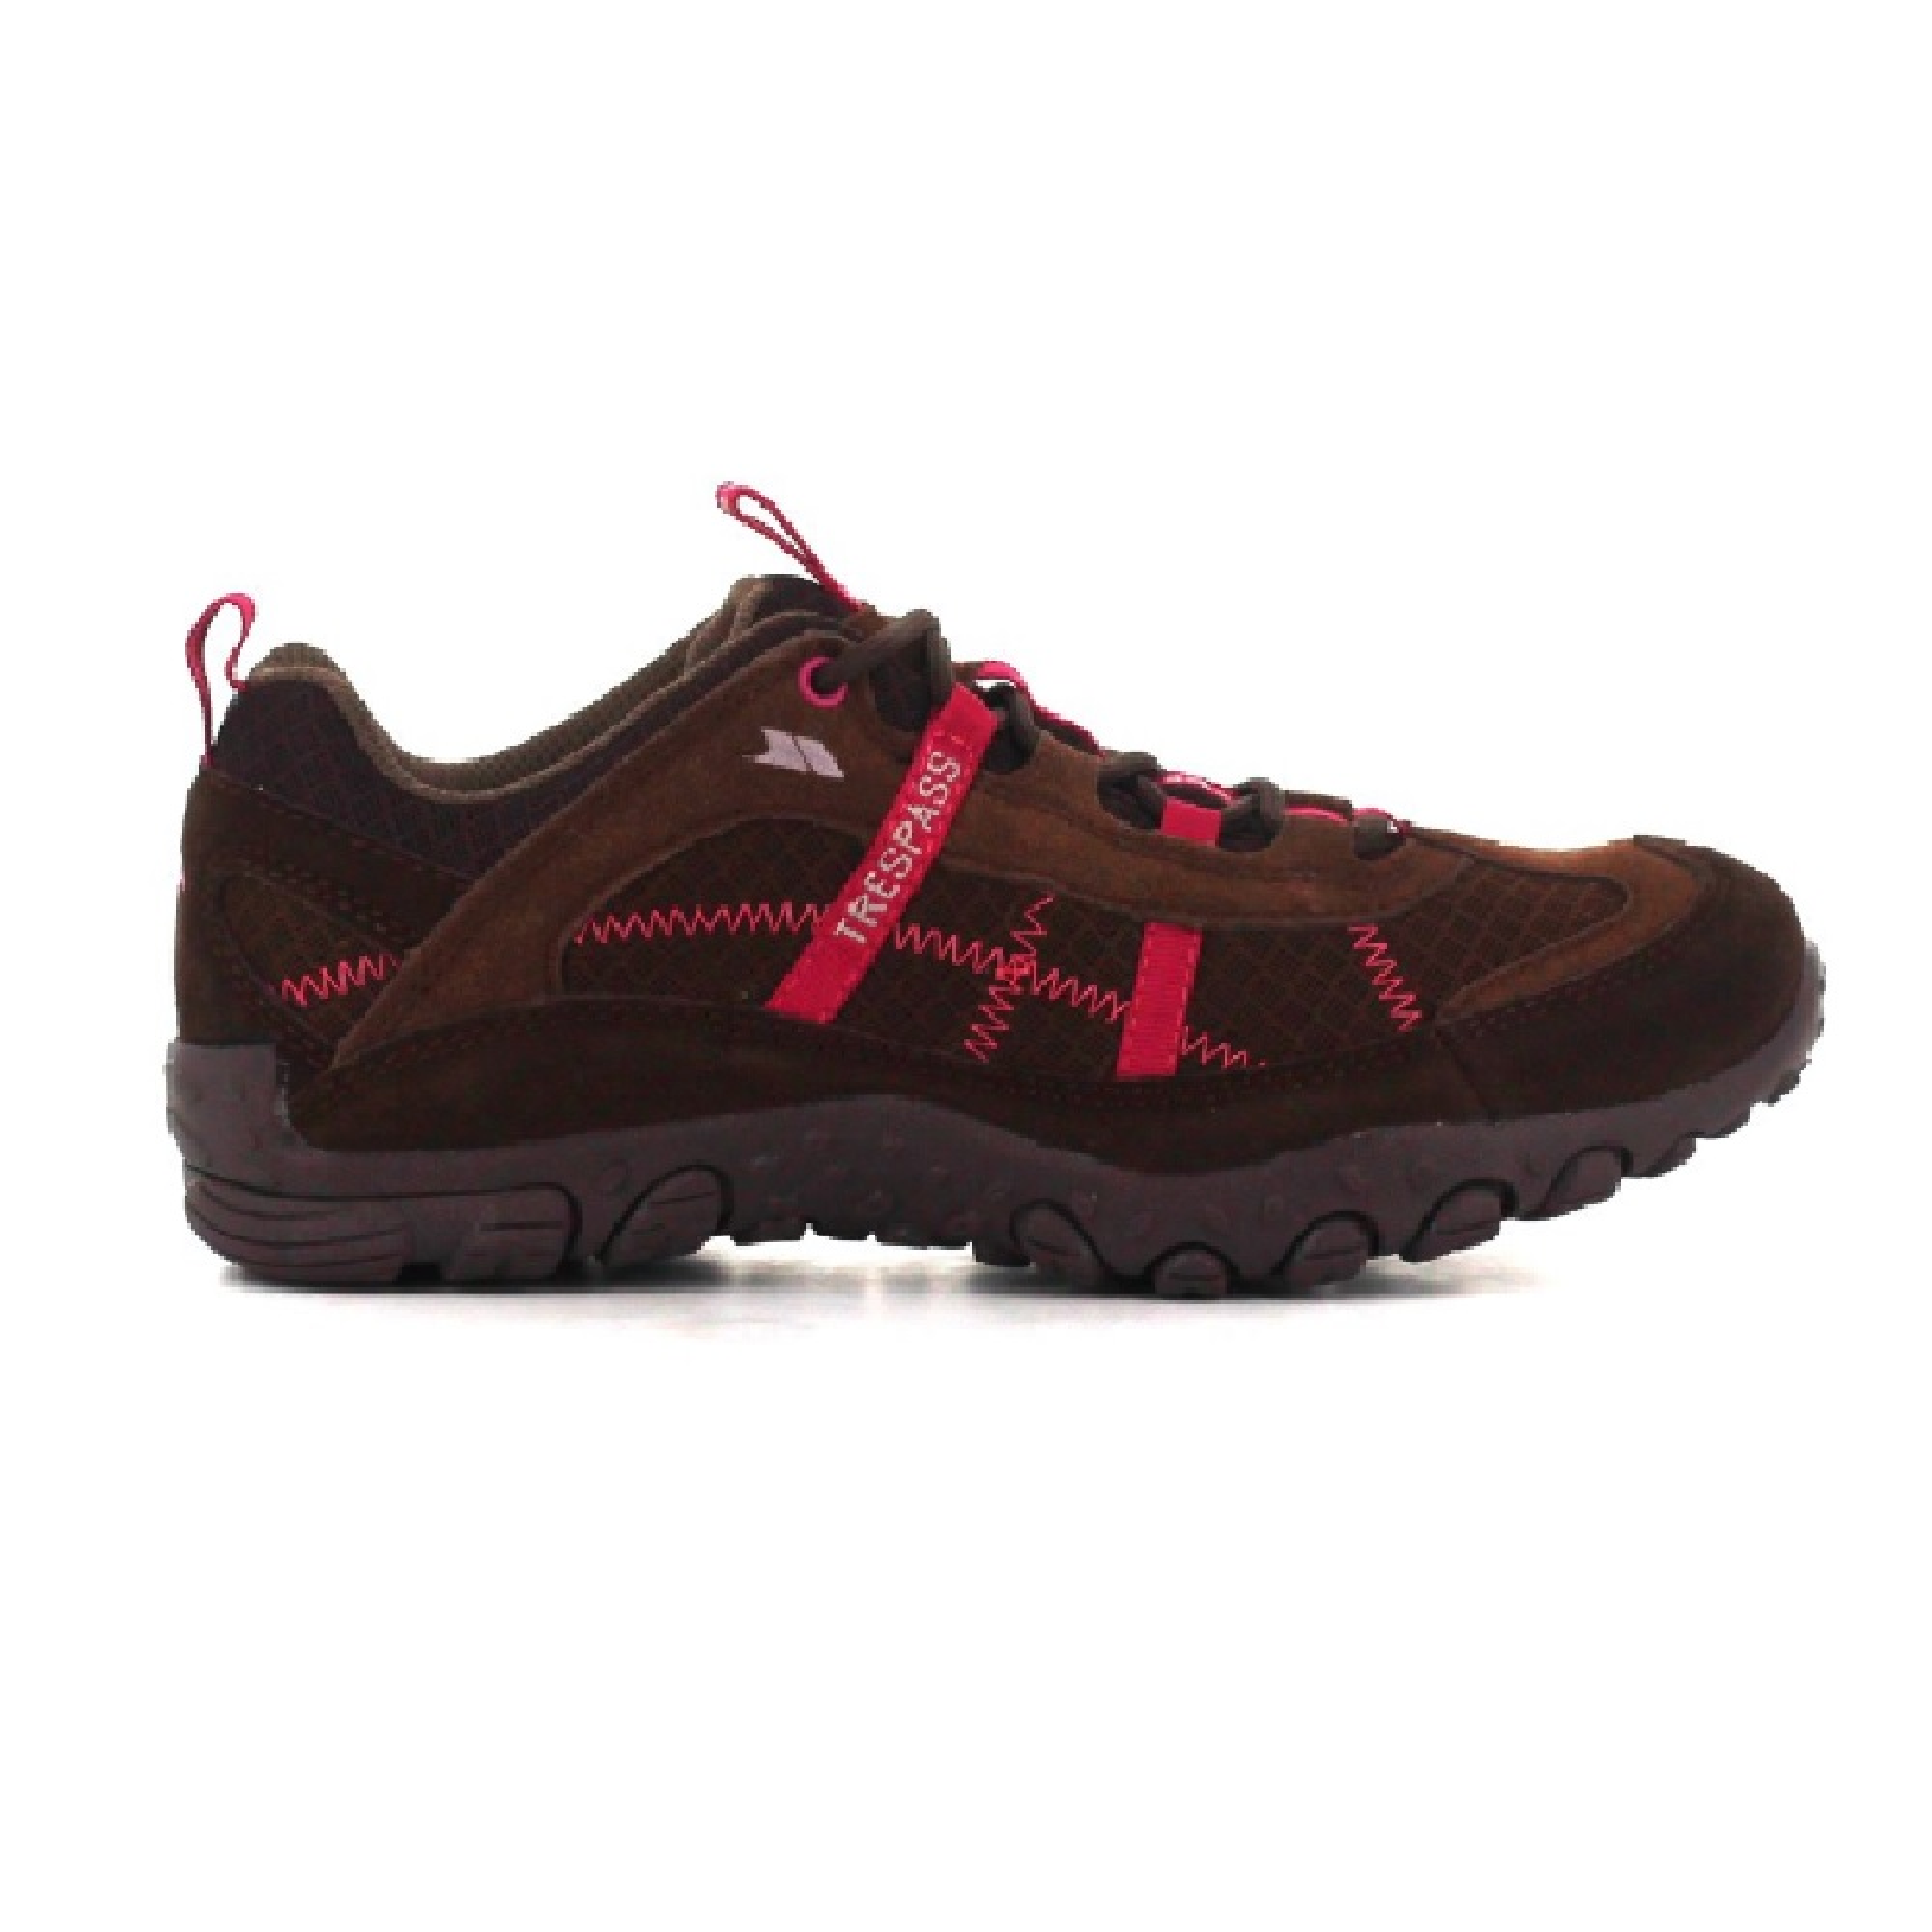 Trespass Womens//Ladies Fell Lightweight Walking Shoes TP154